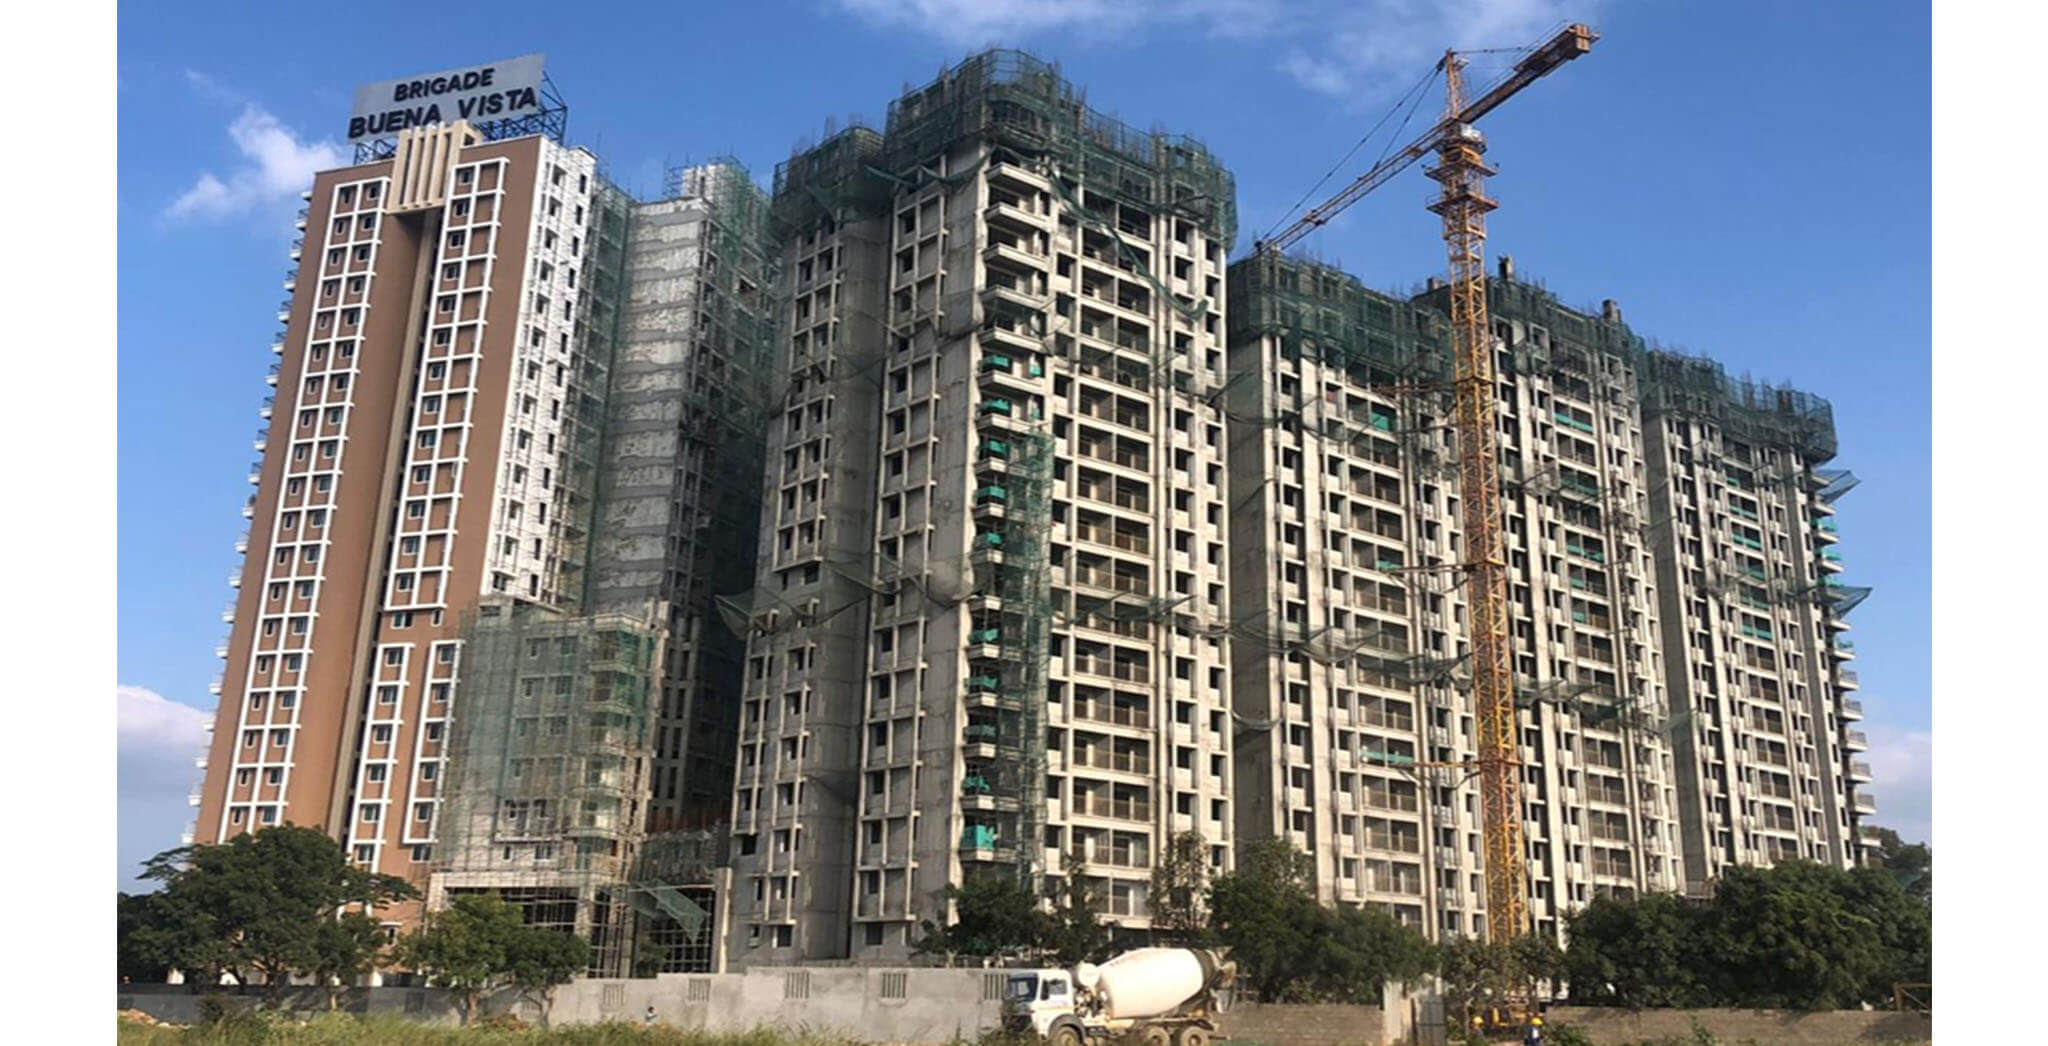 Dec 2019 - Phase2: Tower A—22nd floor in progress & Tower B—21st floor work-in-progress